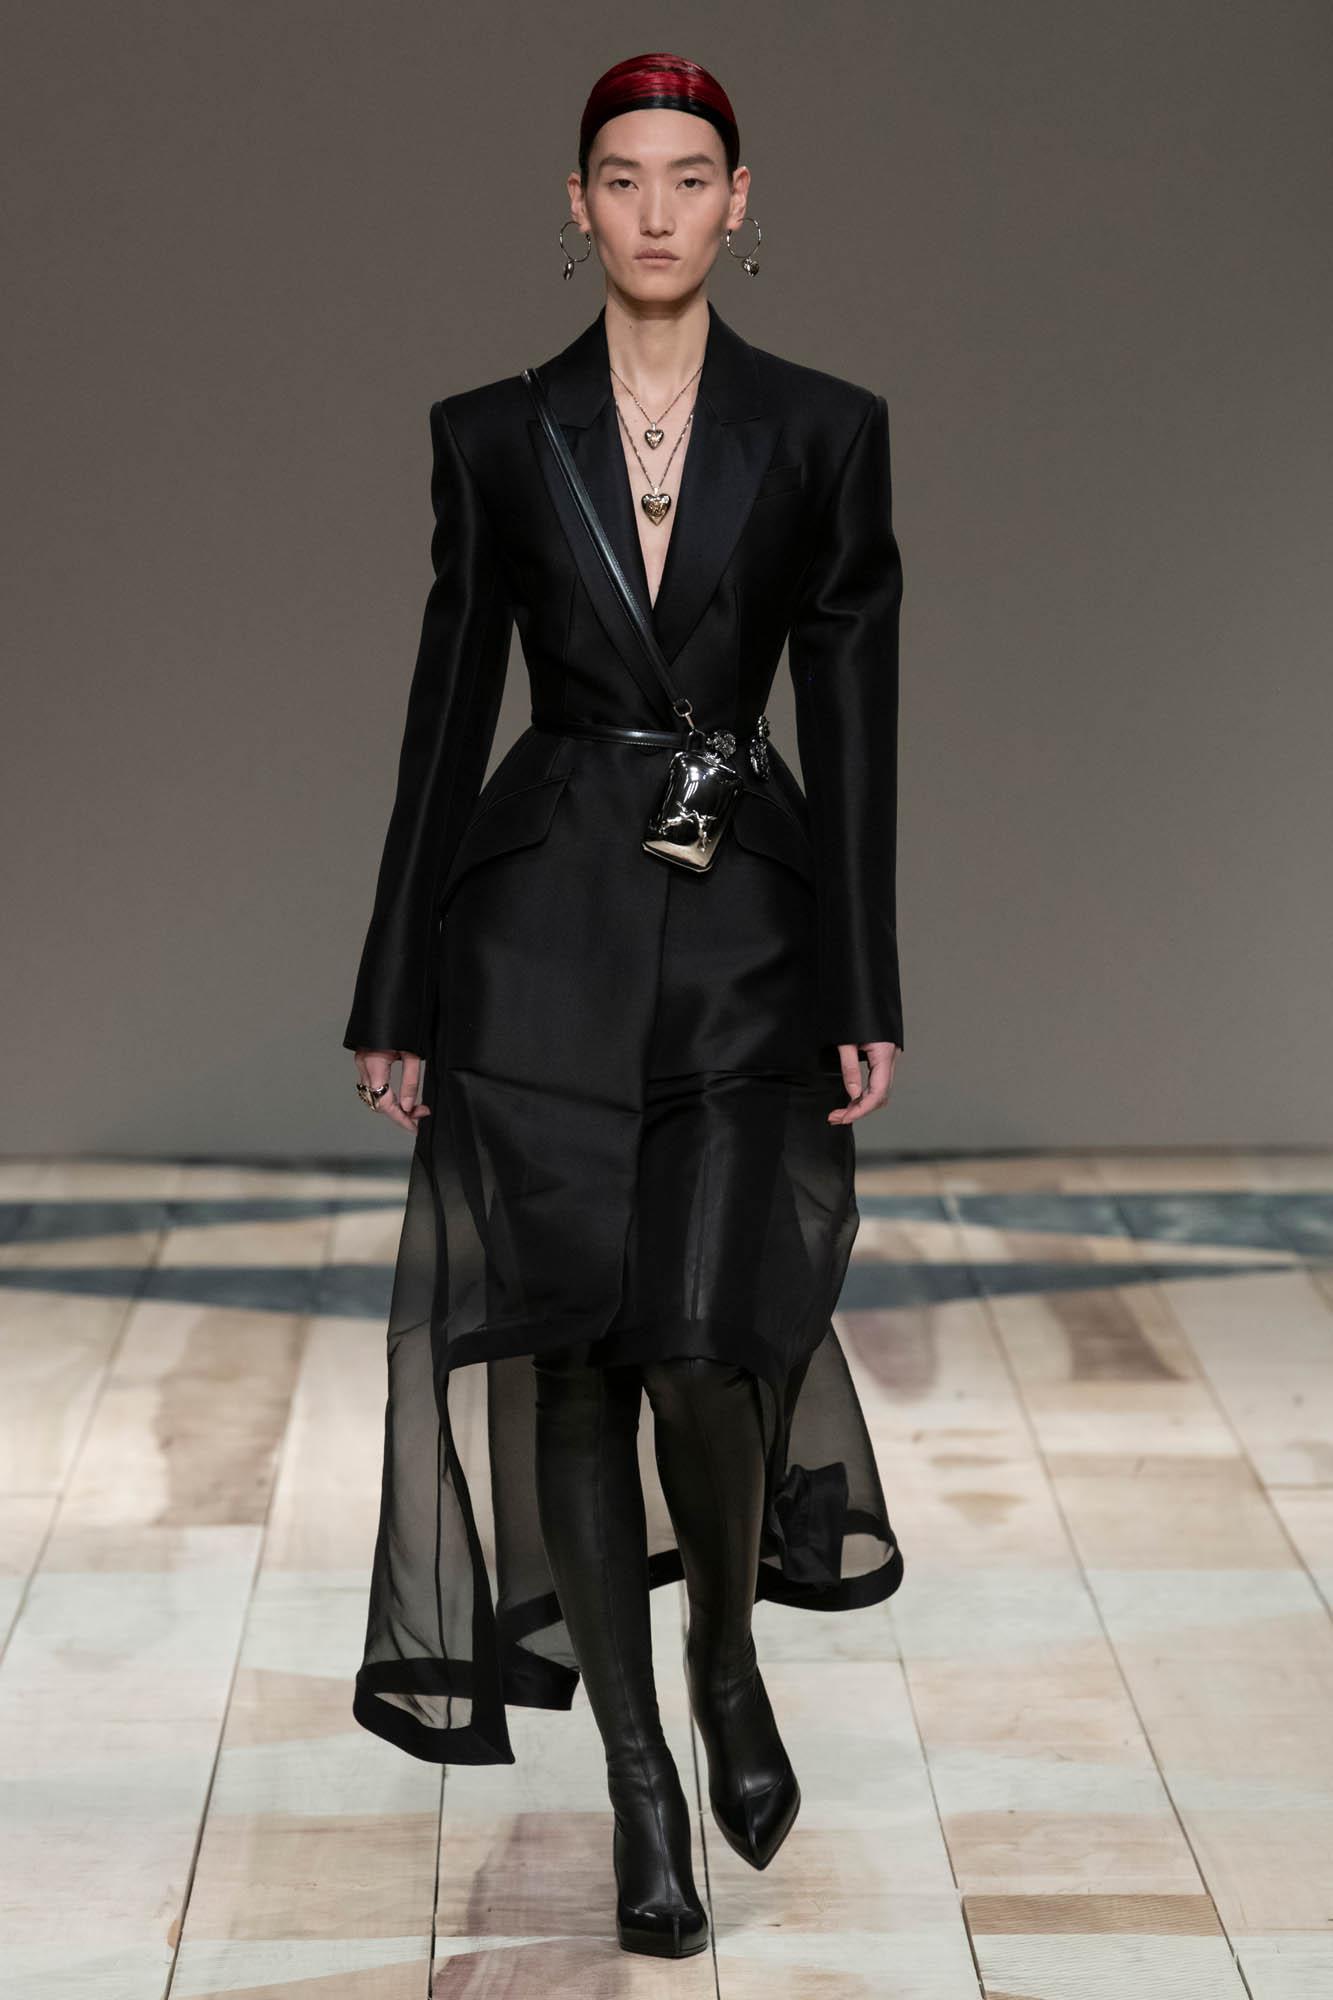 2020 Catwalk Alexander McQueen Woman Fashion Show Winter